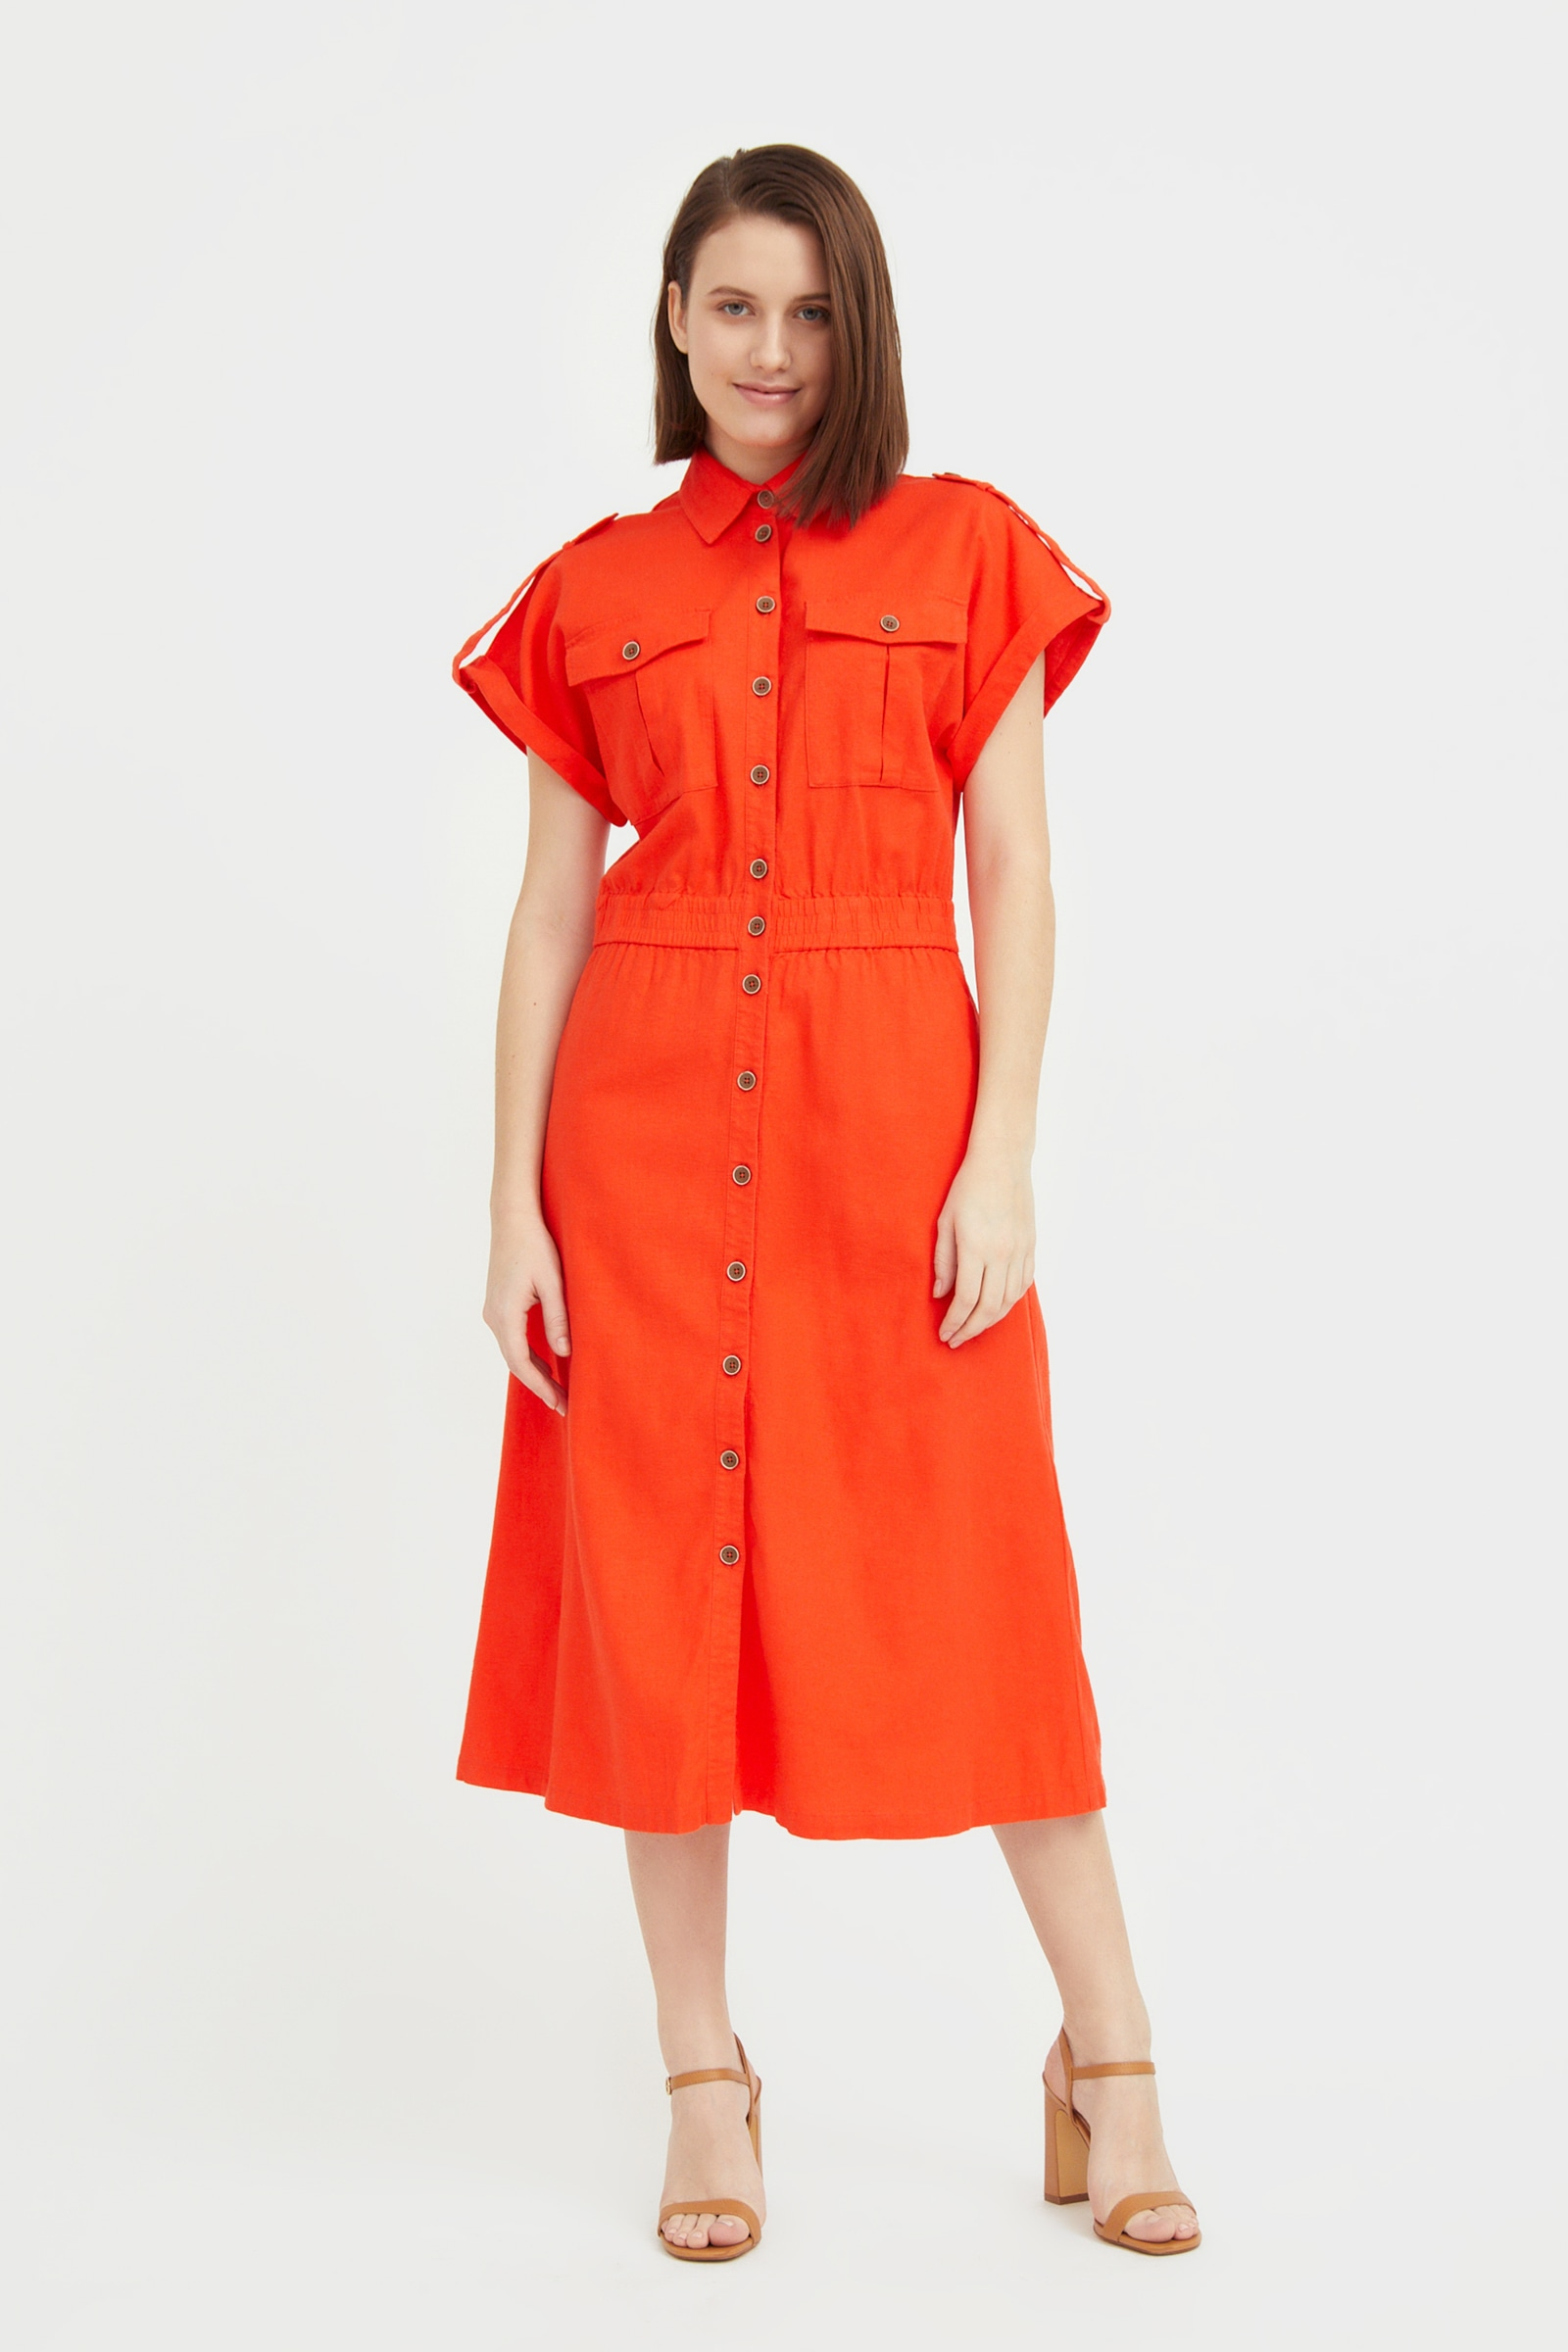 finn flare -  Jerseykleid, mit kurzen Ärmeln